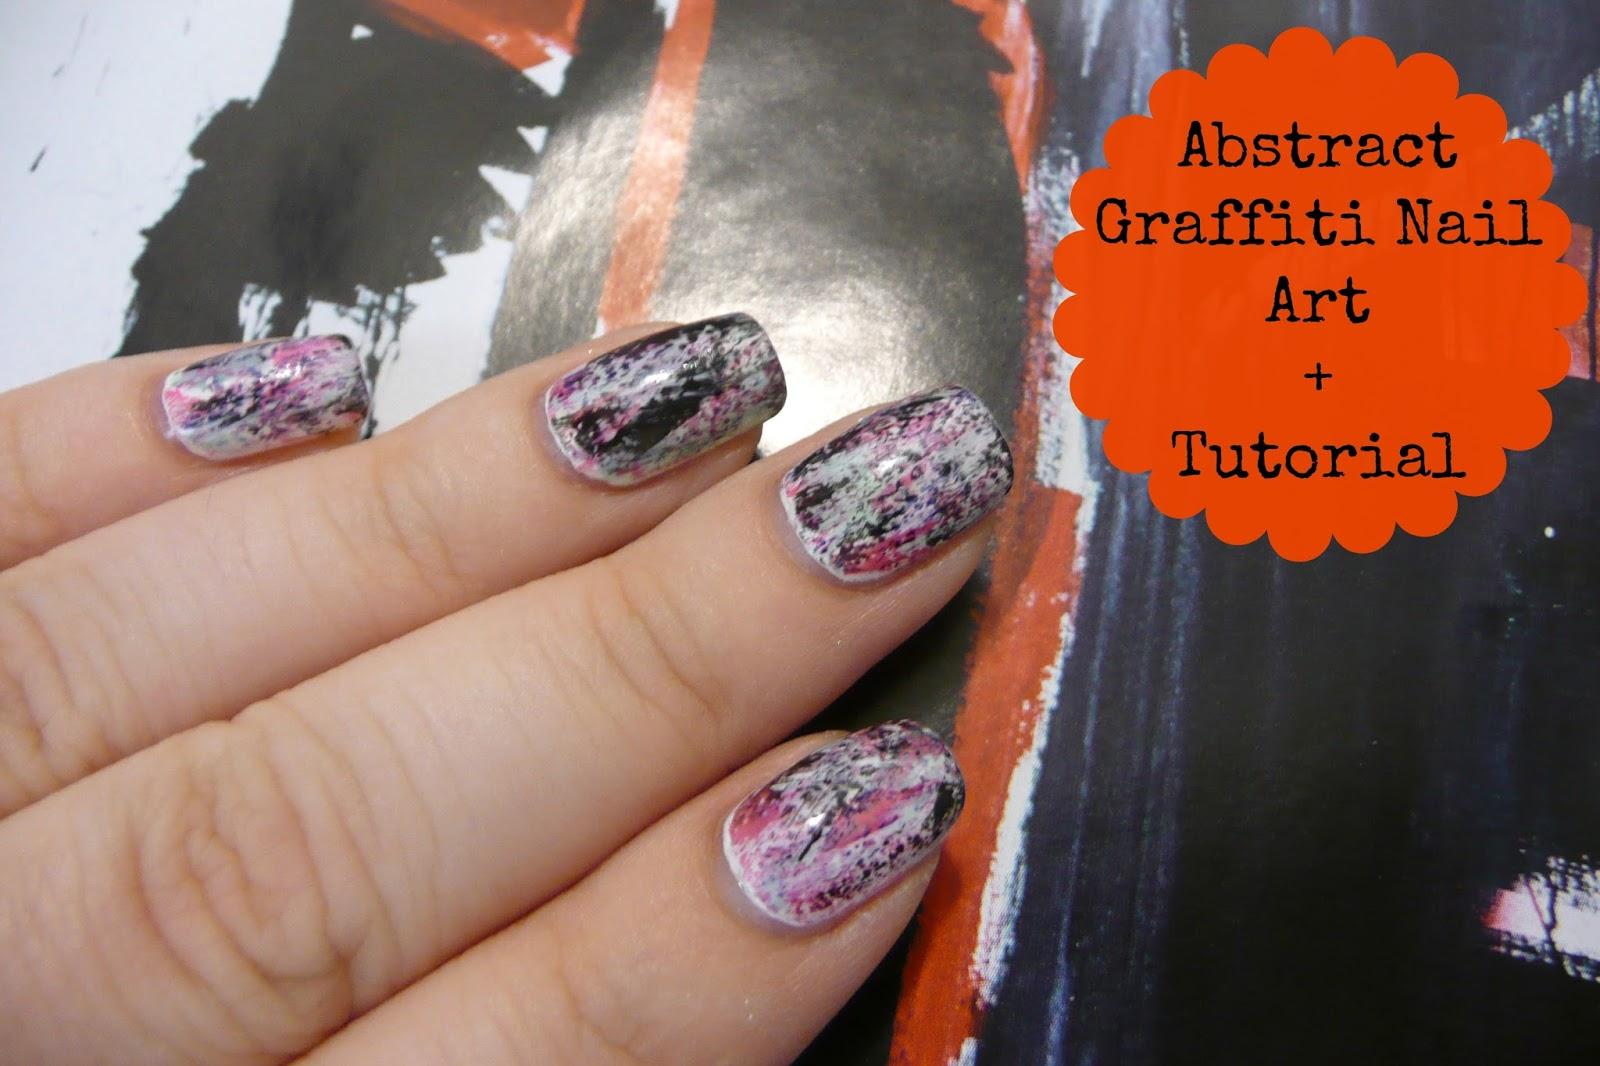 Abstract Graffiti Nail Art Tutorial Kaitlyn Elisabeth Beauty